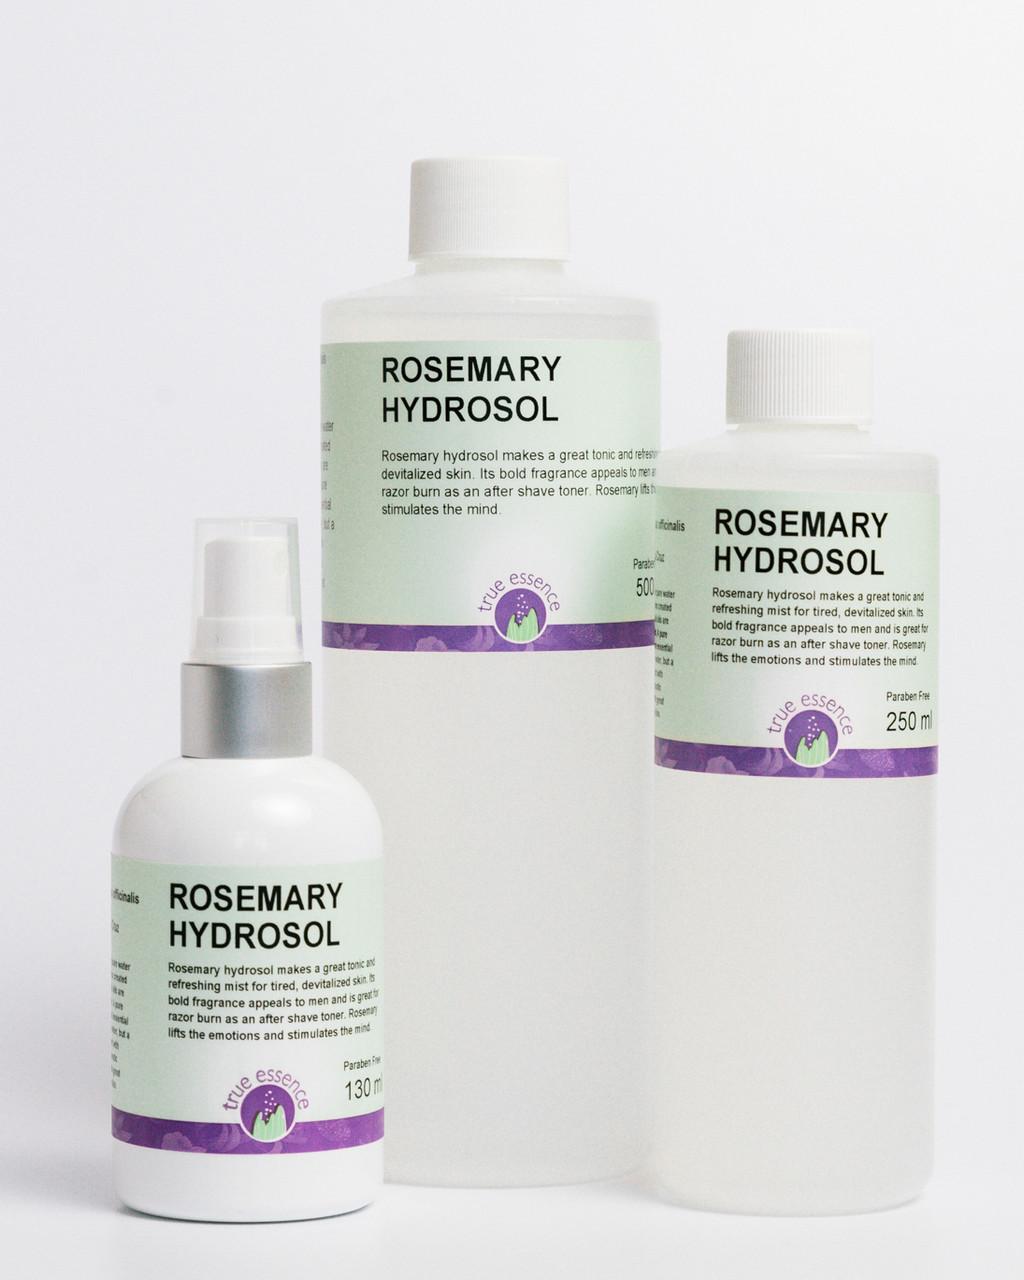 ROSEMARY (Rosmarinus officinalis) Hydrosol